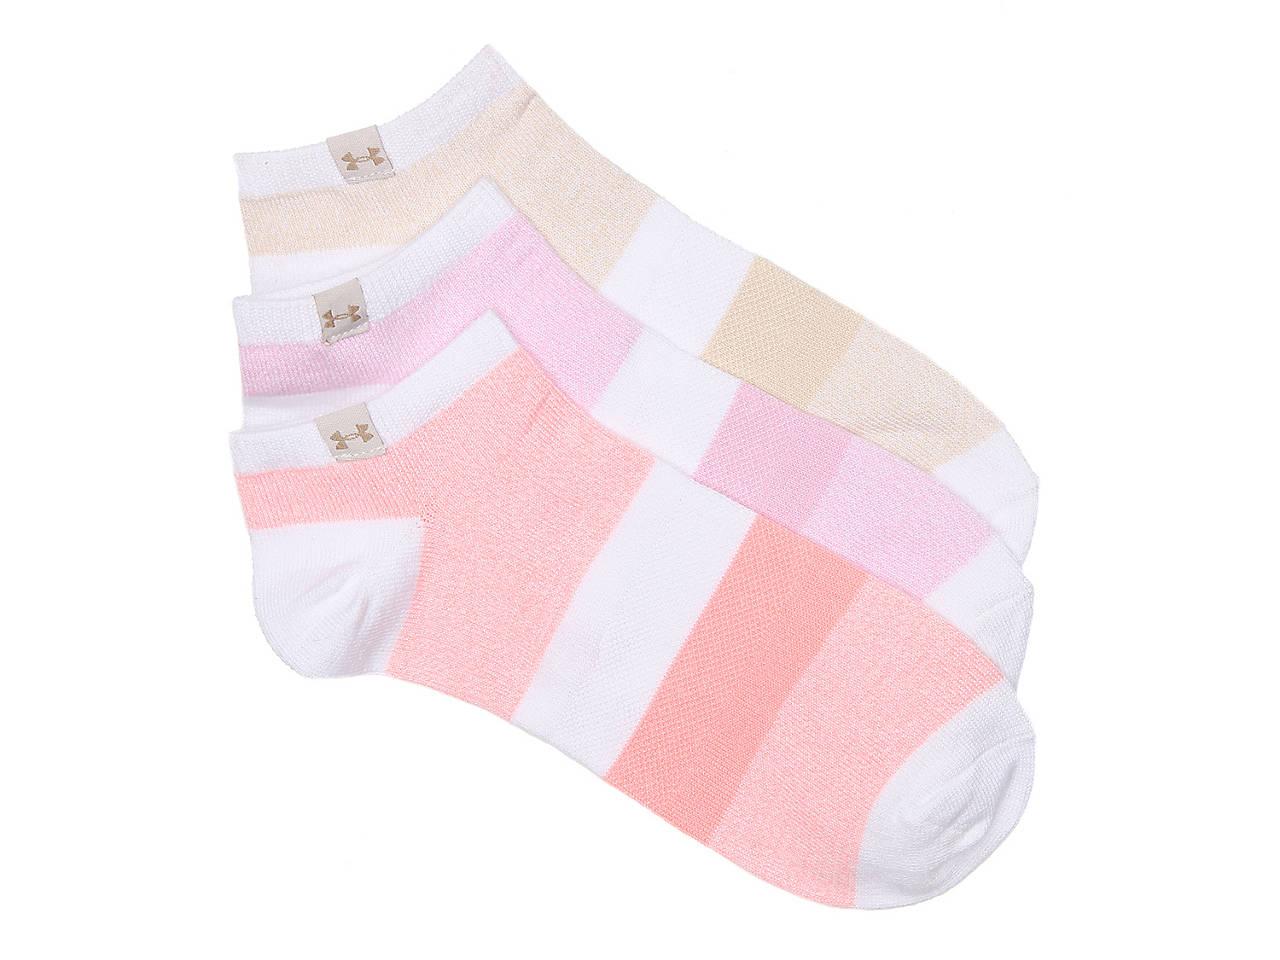 d0bf3380f9 Colorblock Women's Ankle Socks - 3 Pack